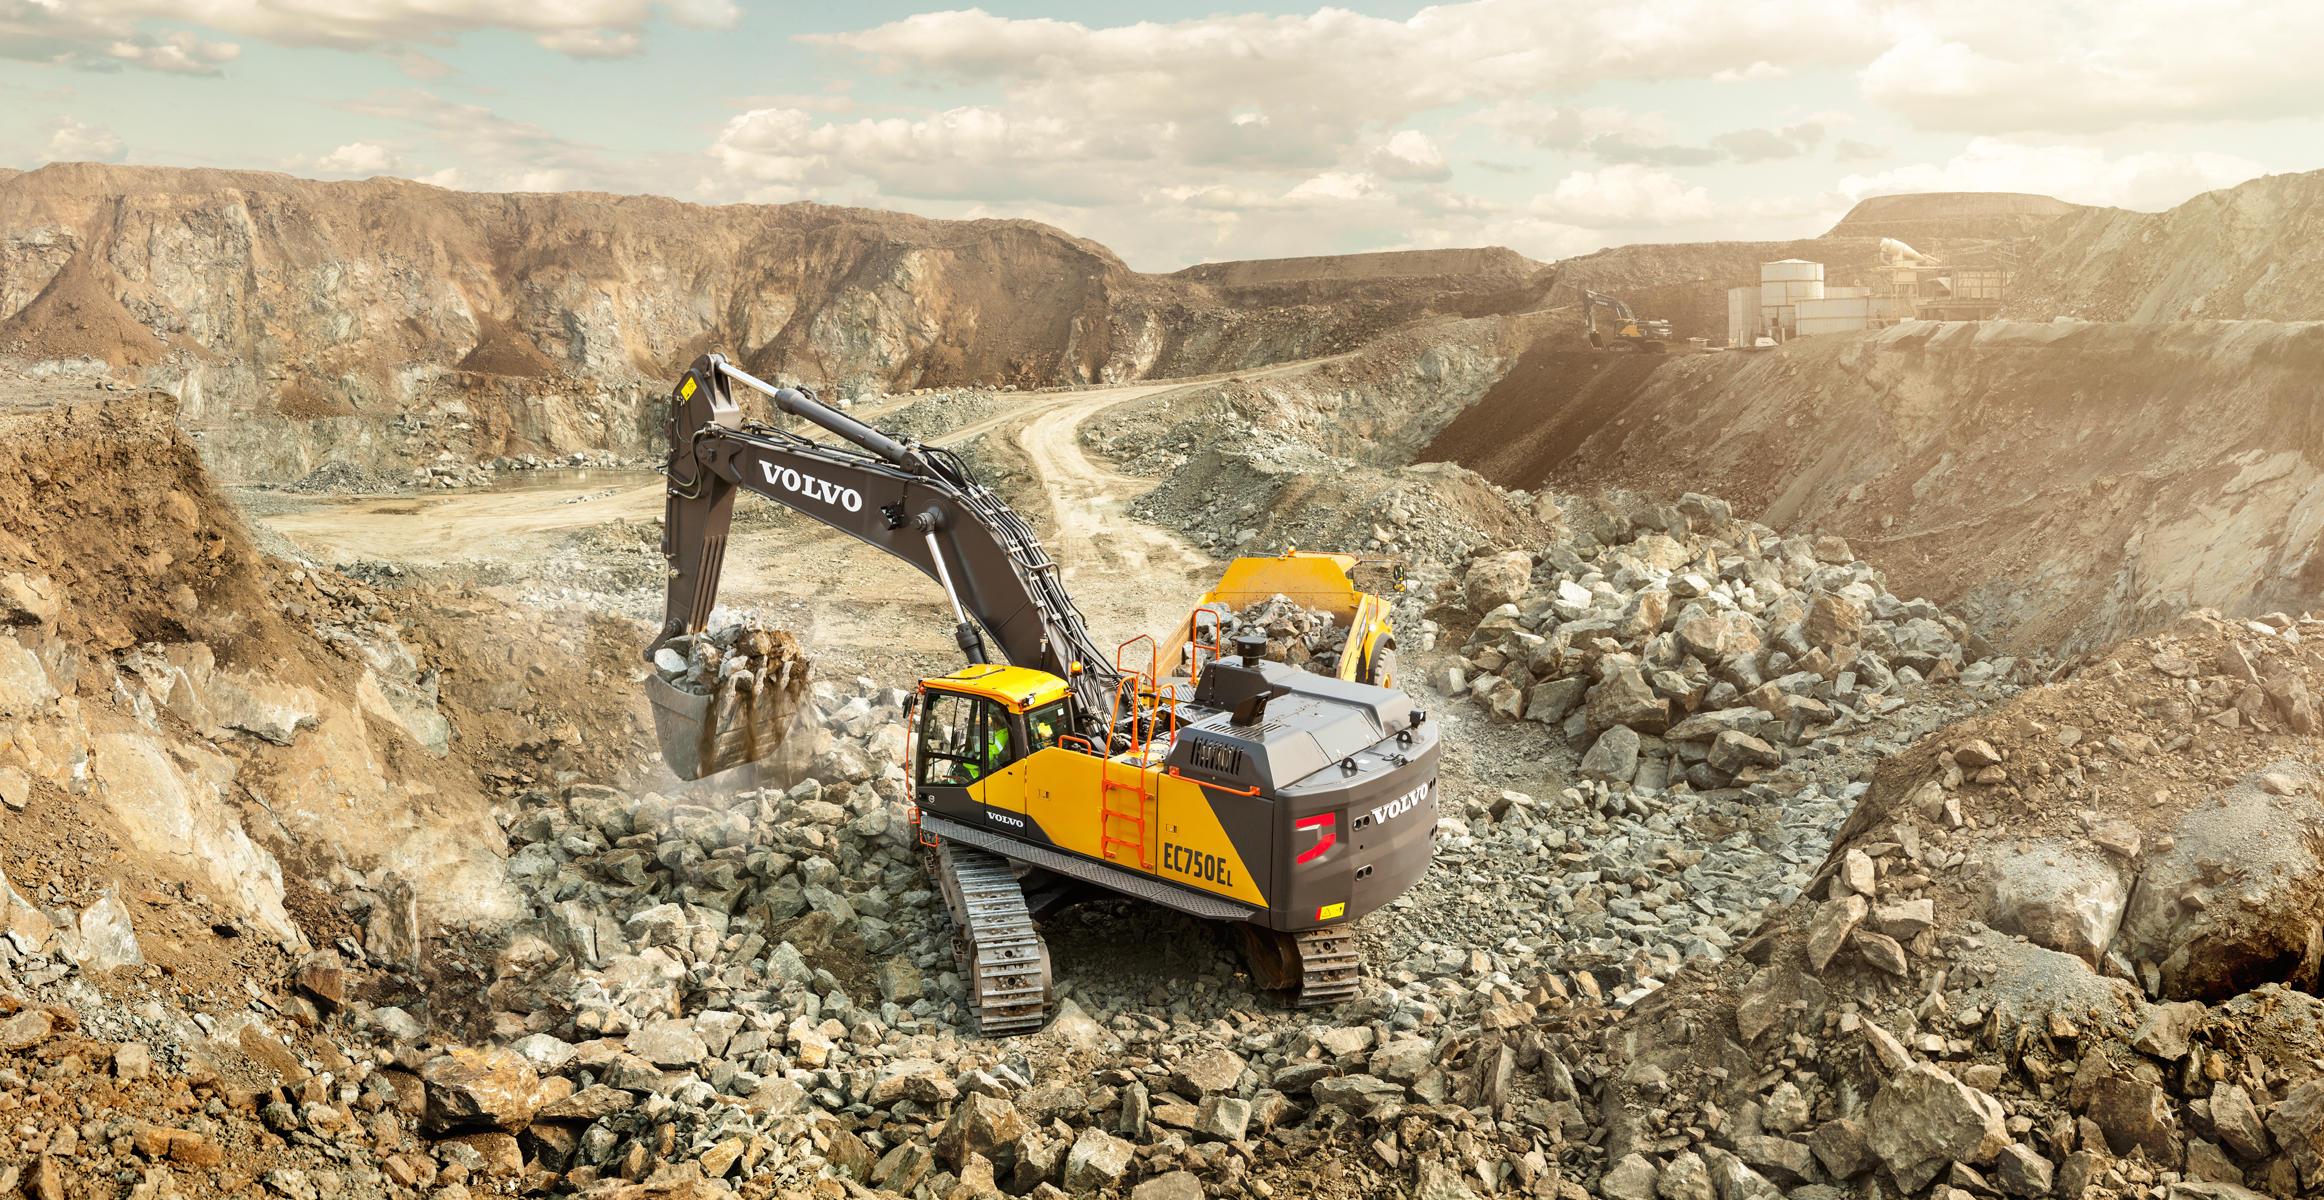 pale grandi le ammiraglie Volvo-benefits-crawler-excavator-ec750e-t4f-superior-digging-performance-2324x1200